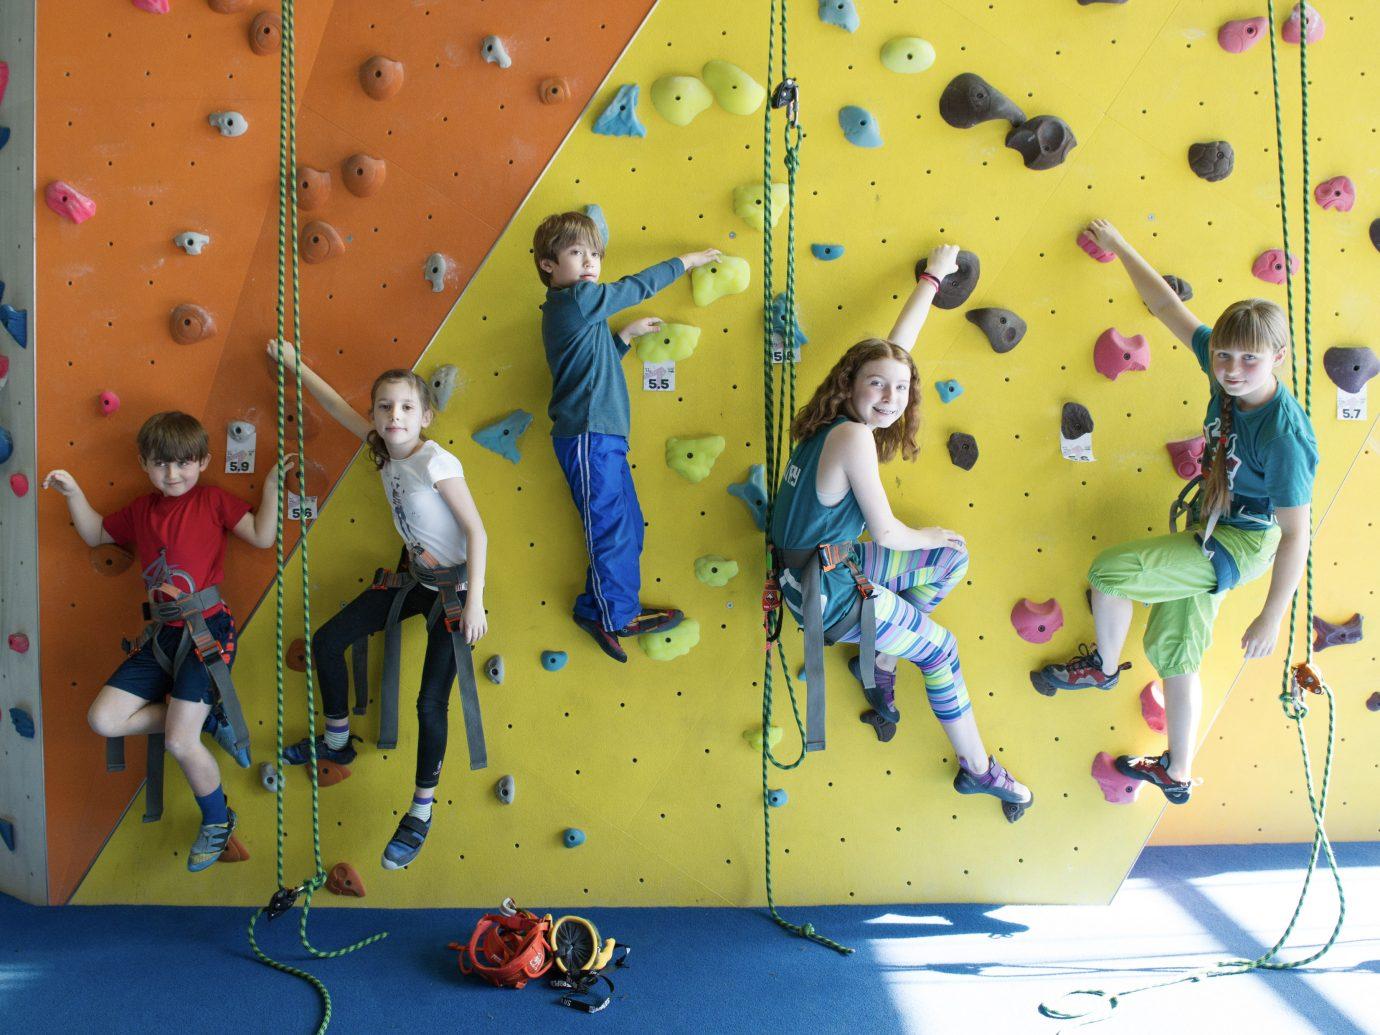 kids hanging on rock climbing wall posing for photo